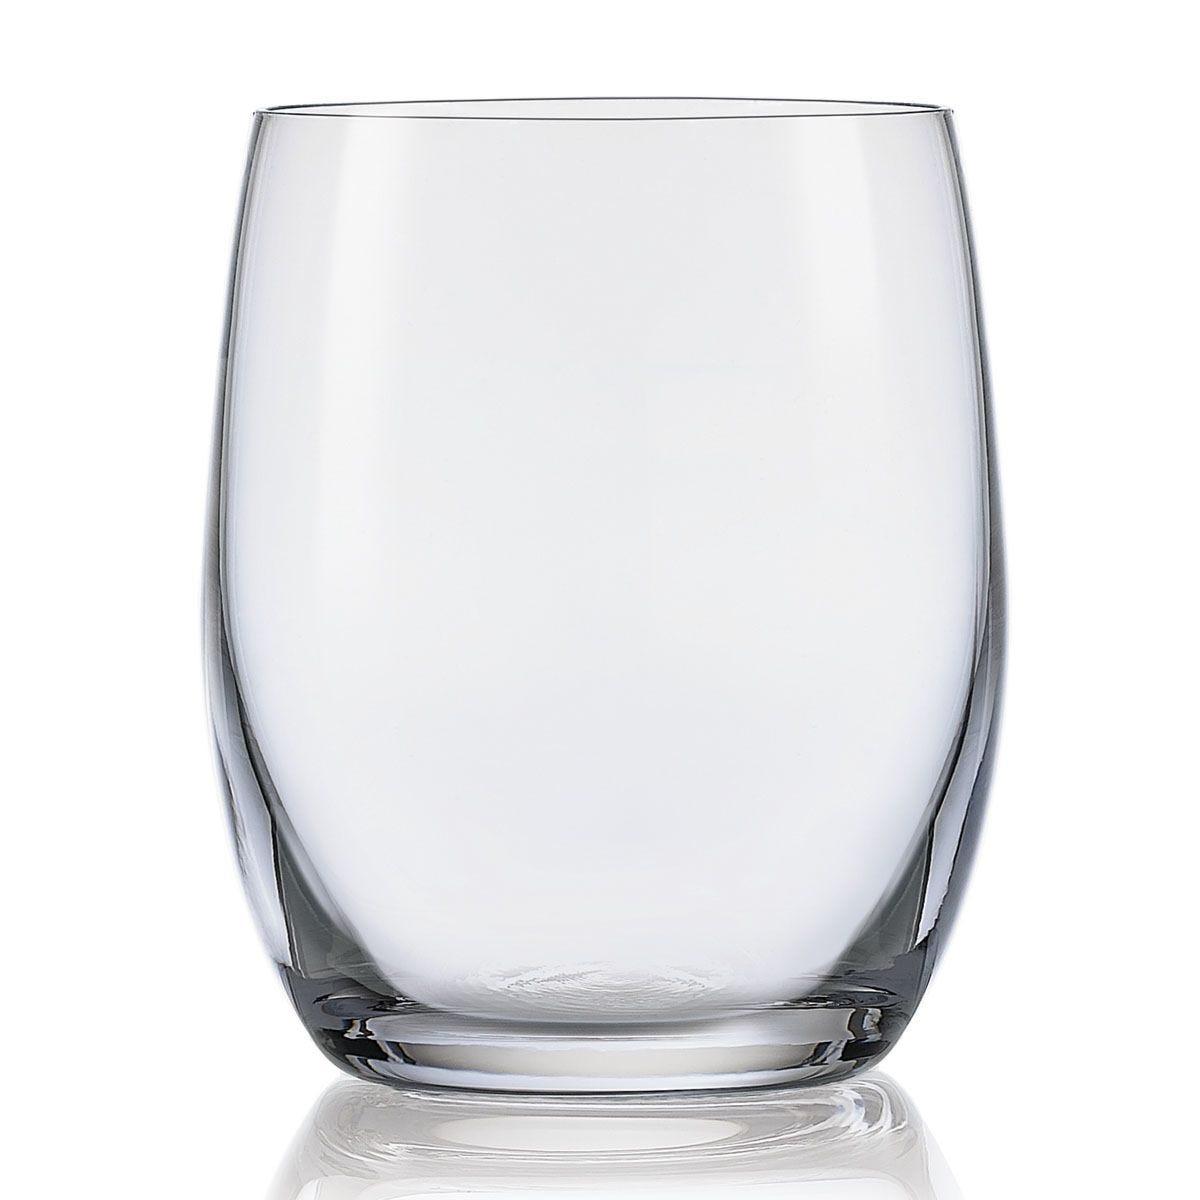 Royal Boch Tumbler Glass - Set of 2